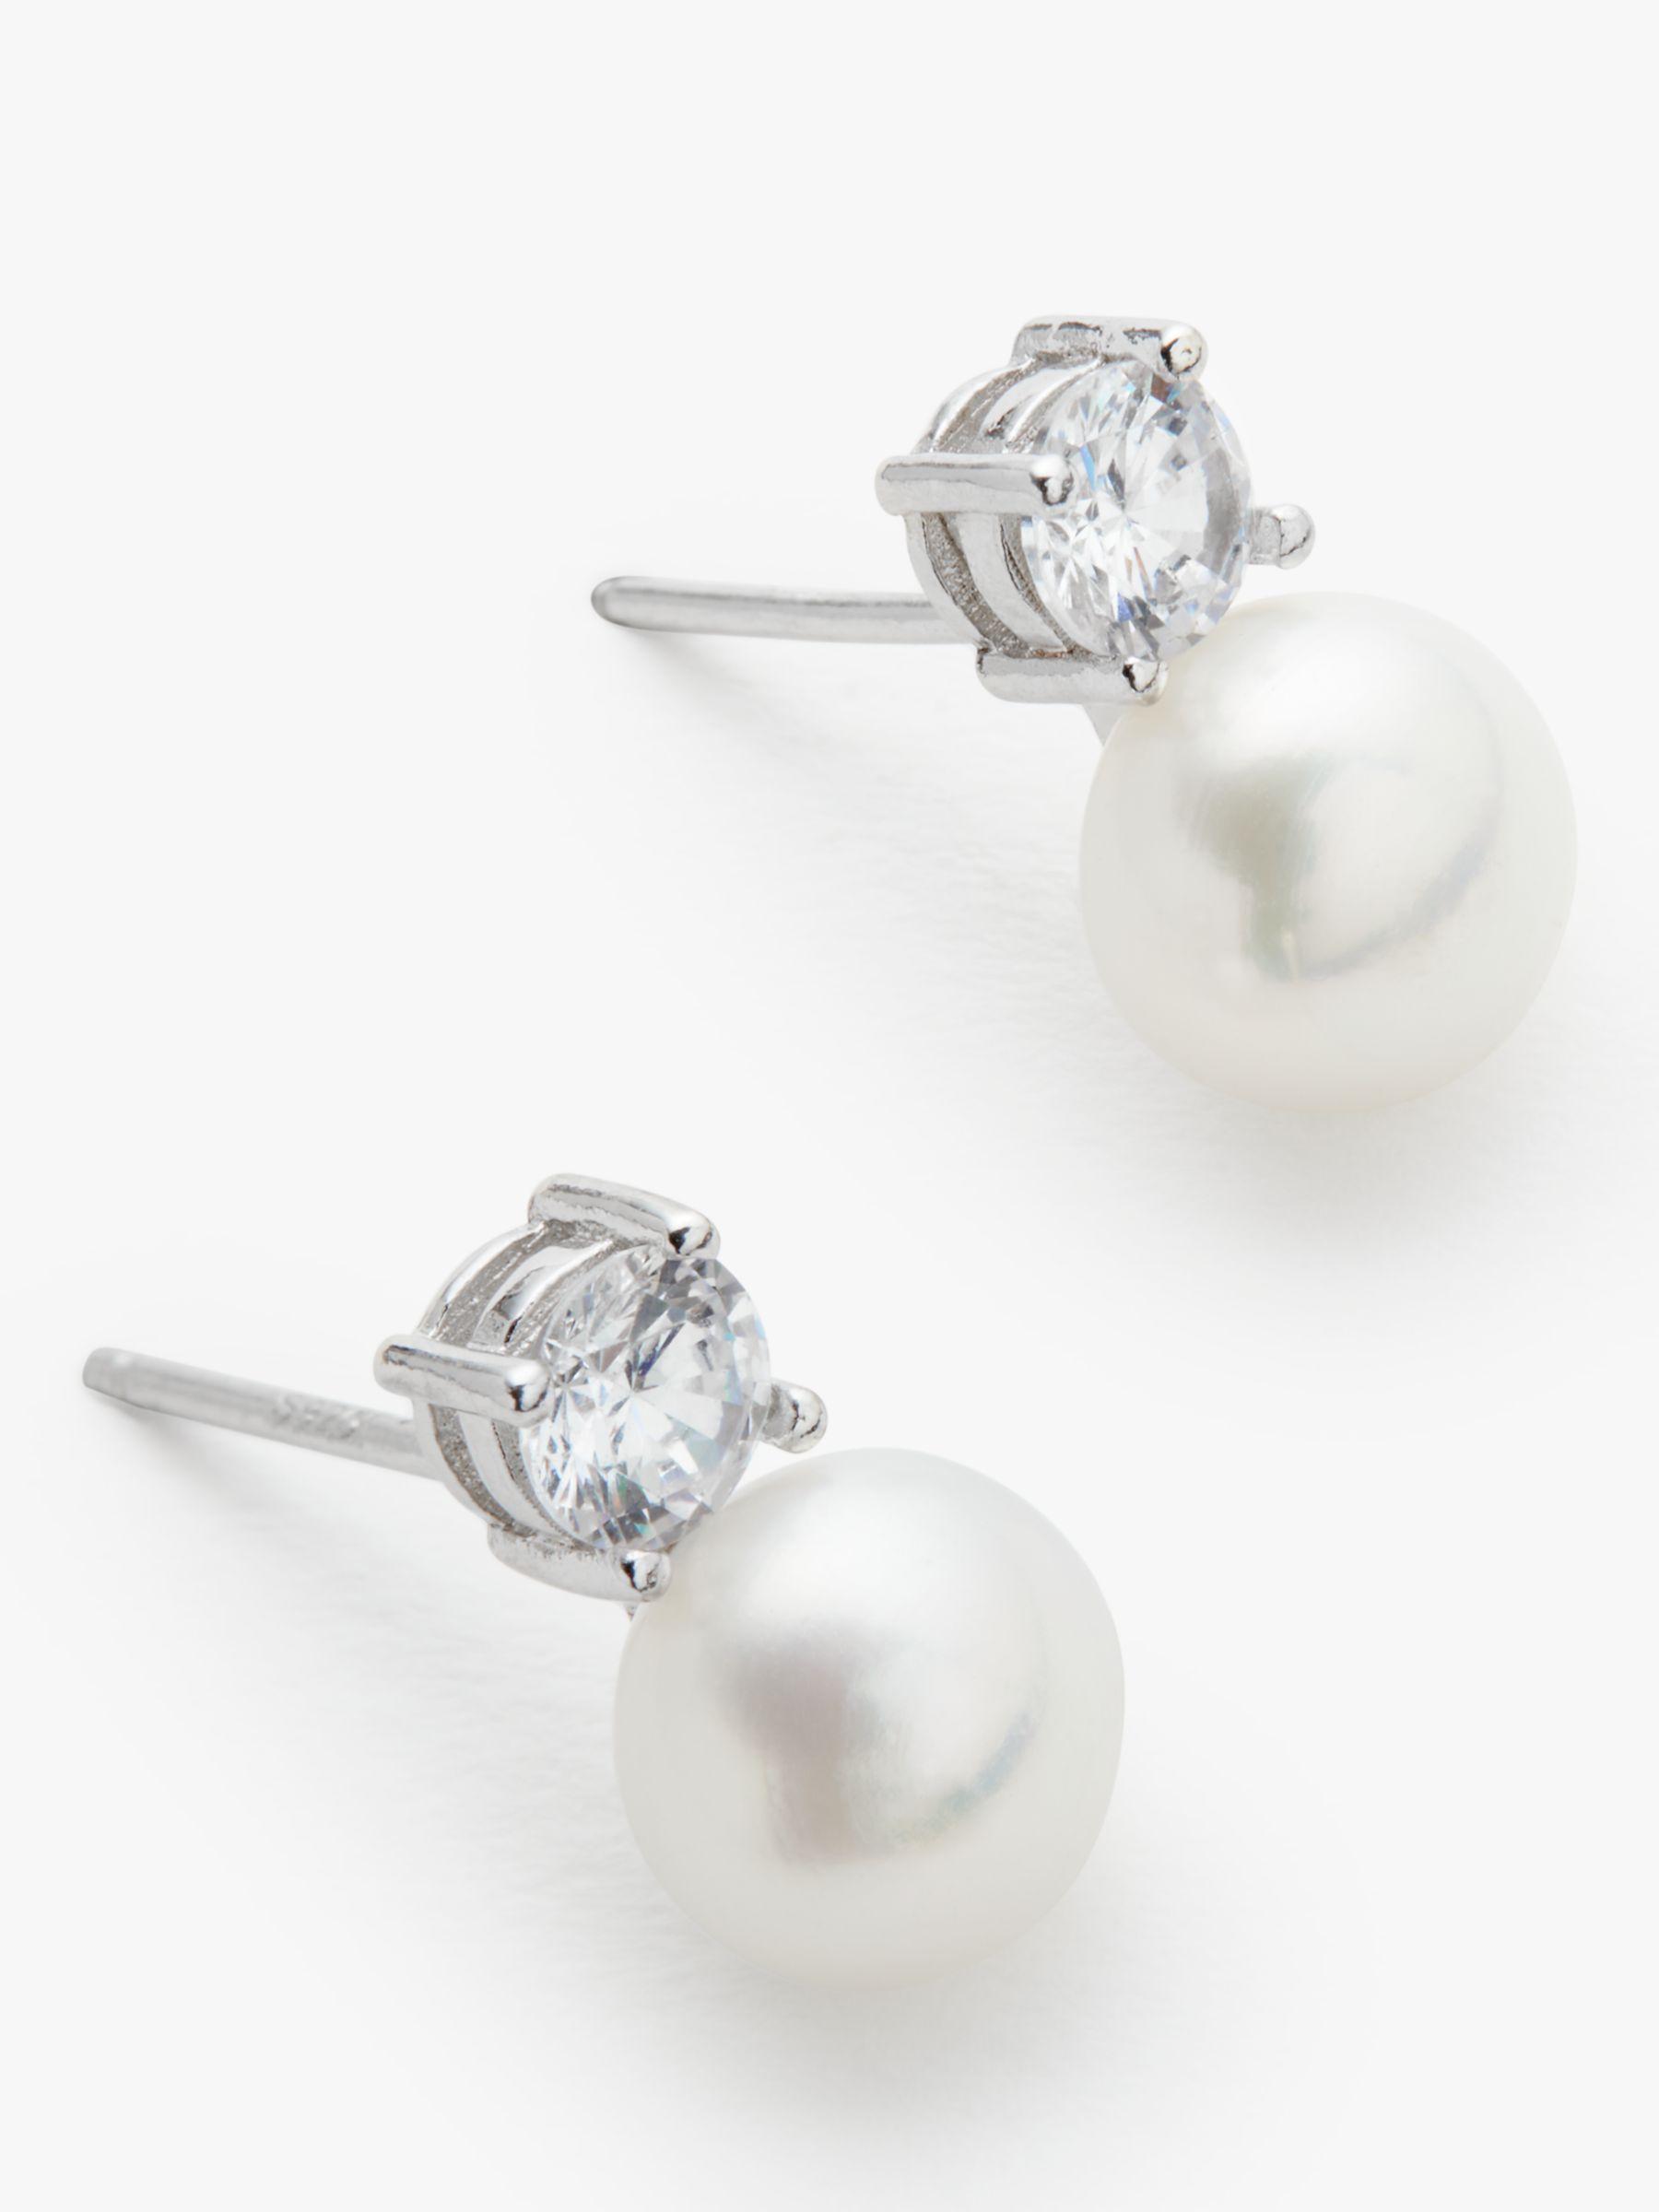 Lido Pearls Lido Pearls Freshwater Pearl Stud Earrings, White/Silver